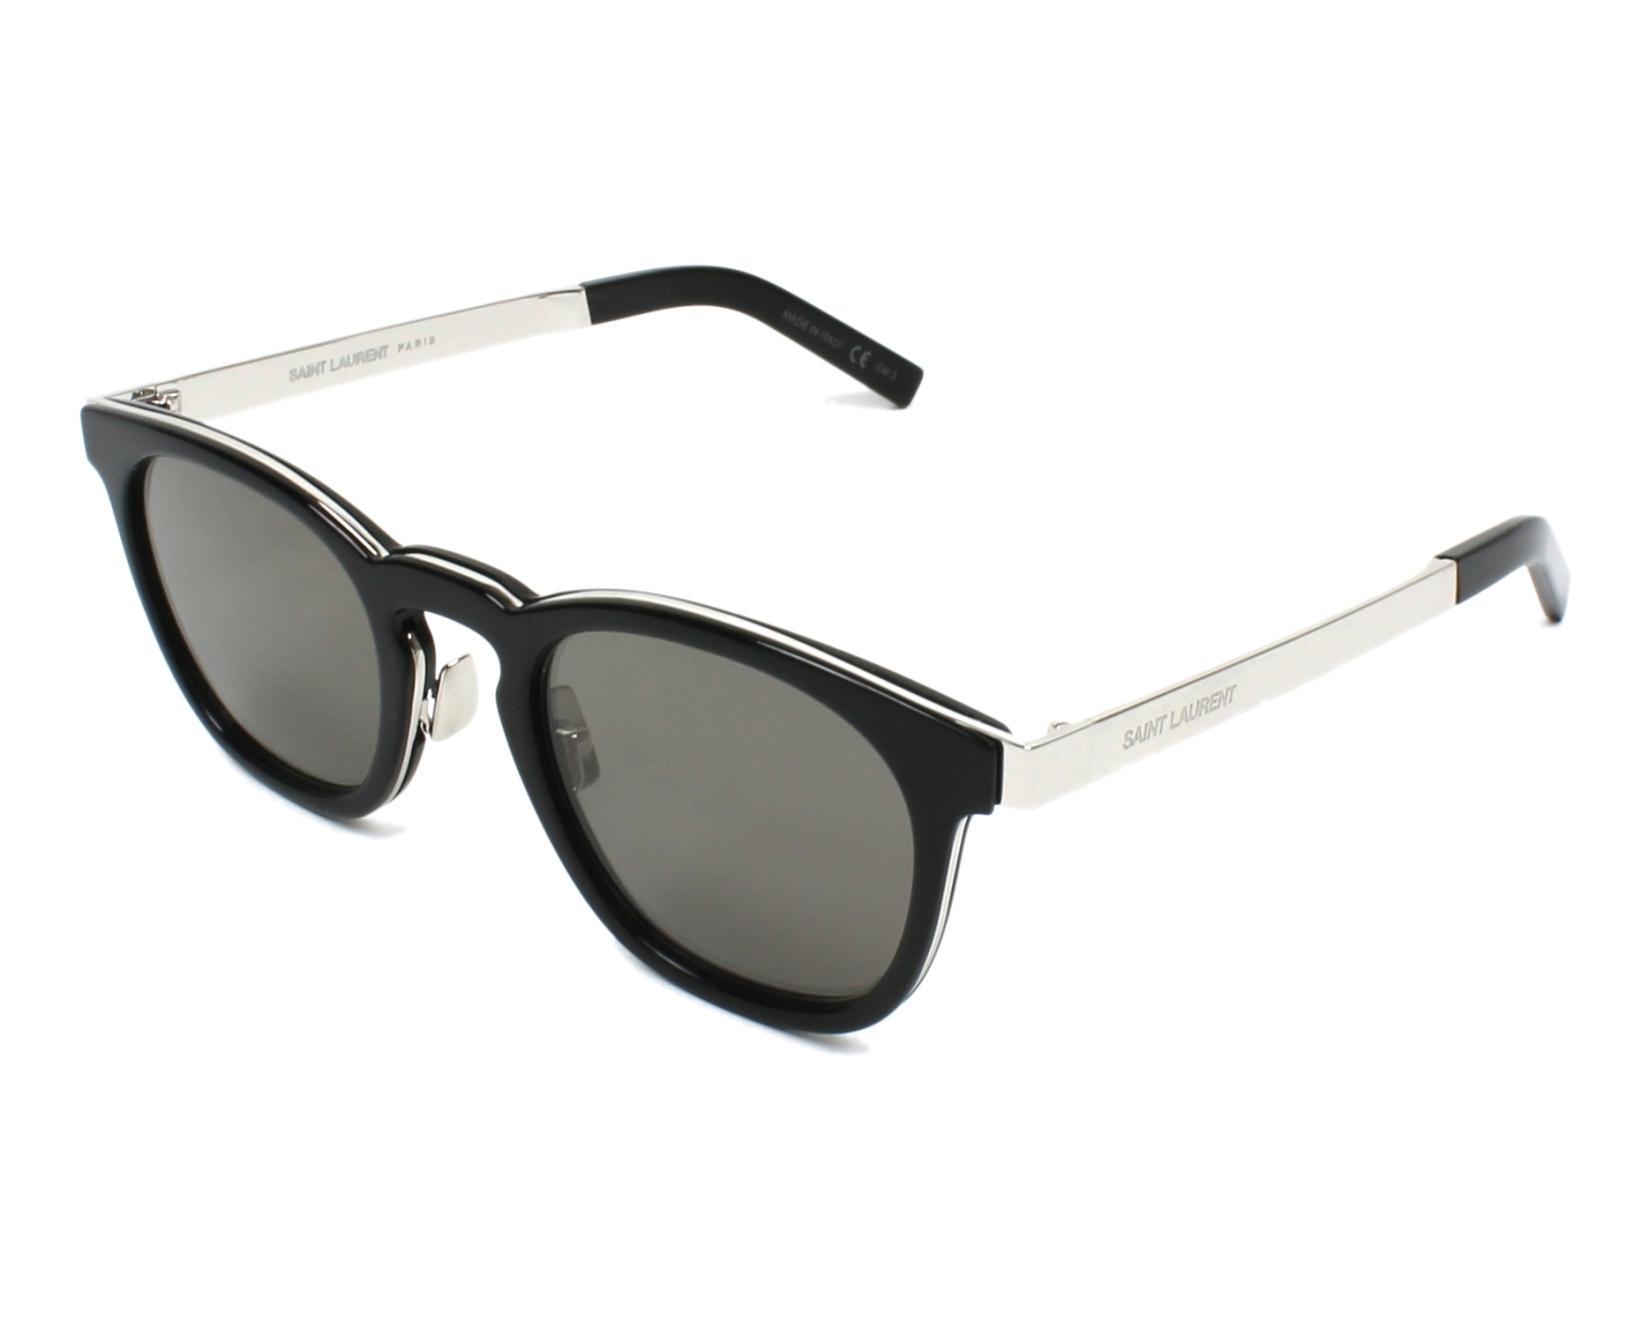 Saint Laurent SL28 Sonnenbrille Schwarz 001 49mm 2V8Oi4M23O